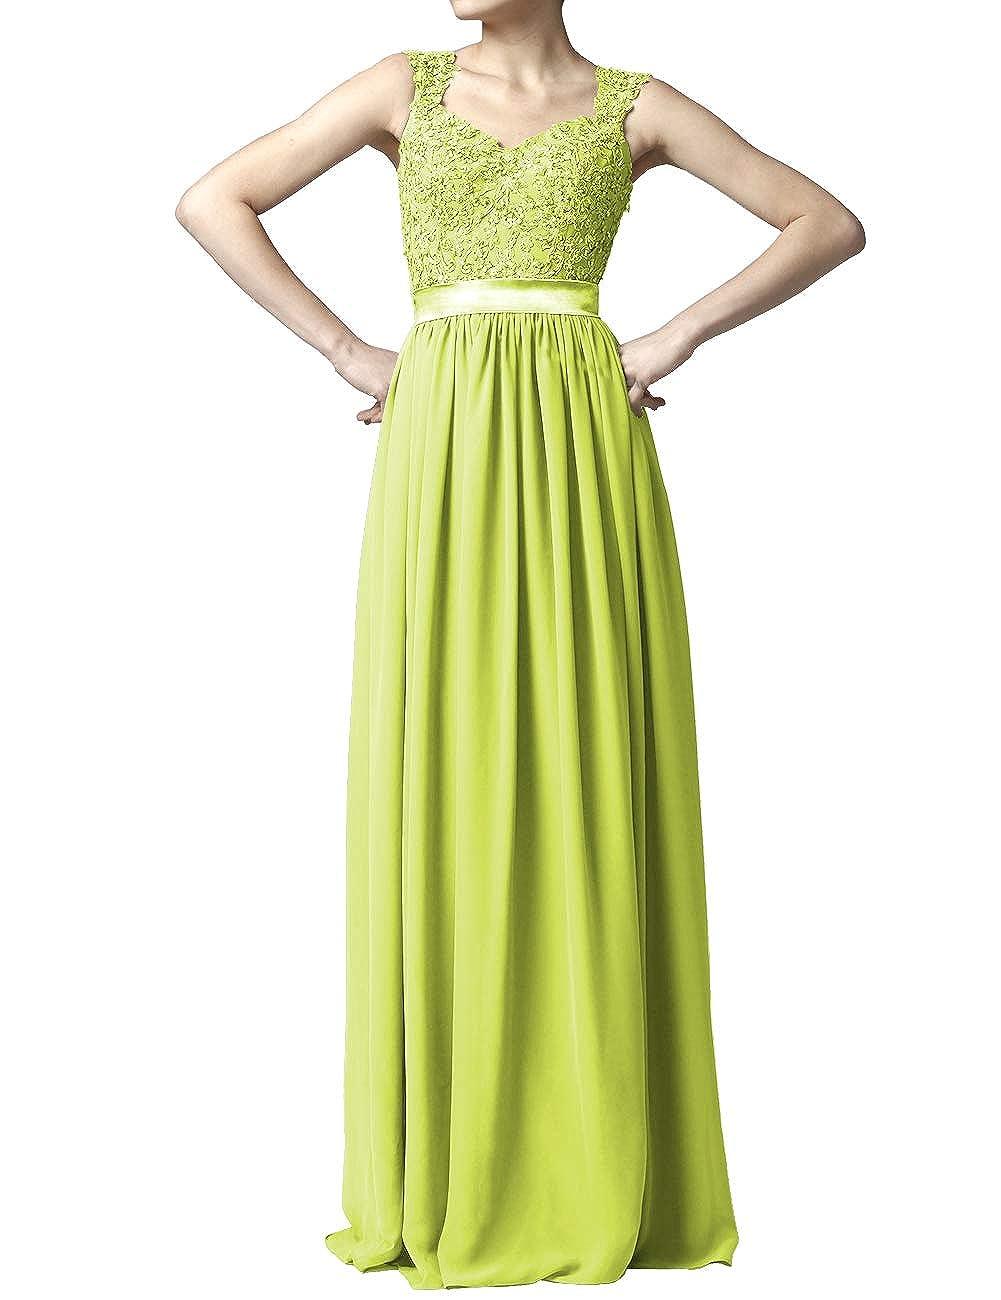 Lemon Green Women' Cap Sleeve Lace Bridesmaid Dresses Long Wedding Party Gowns